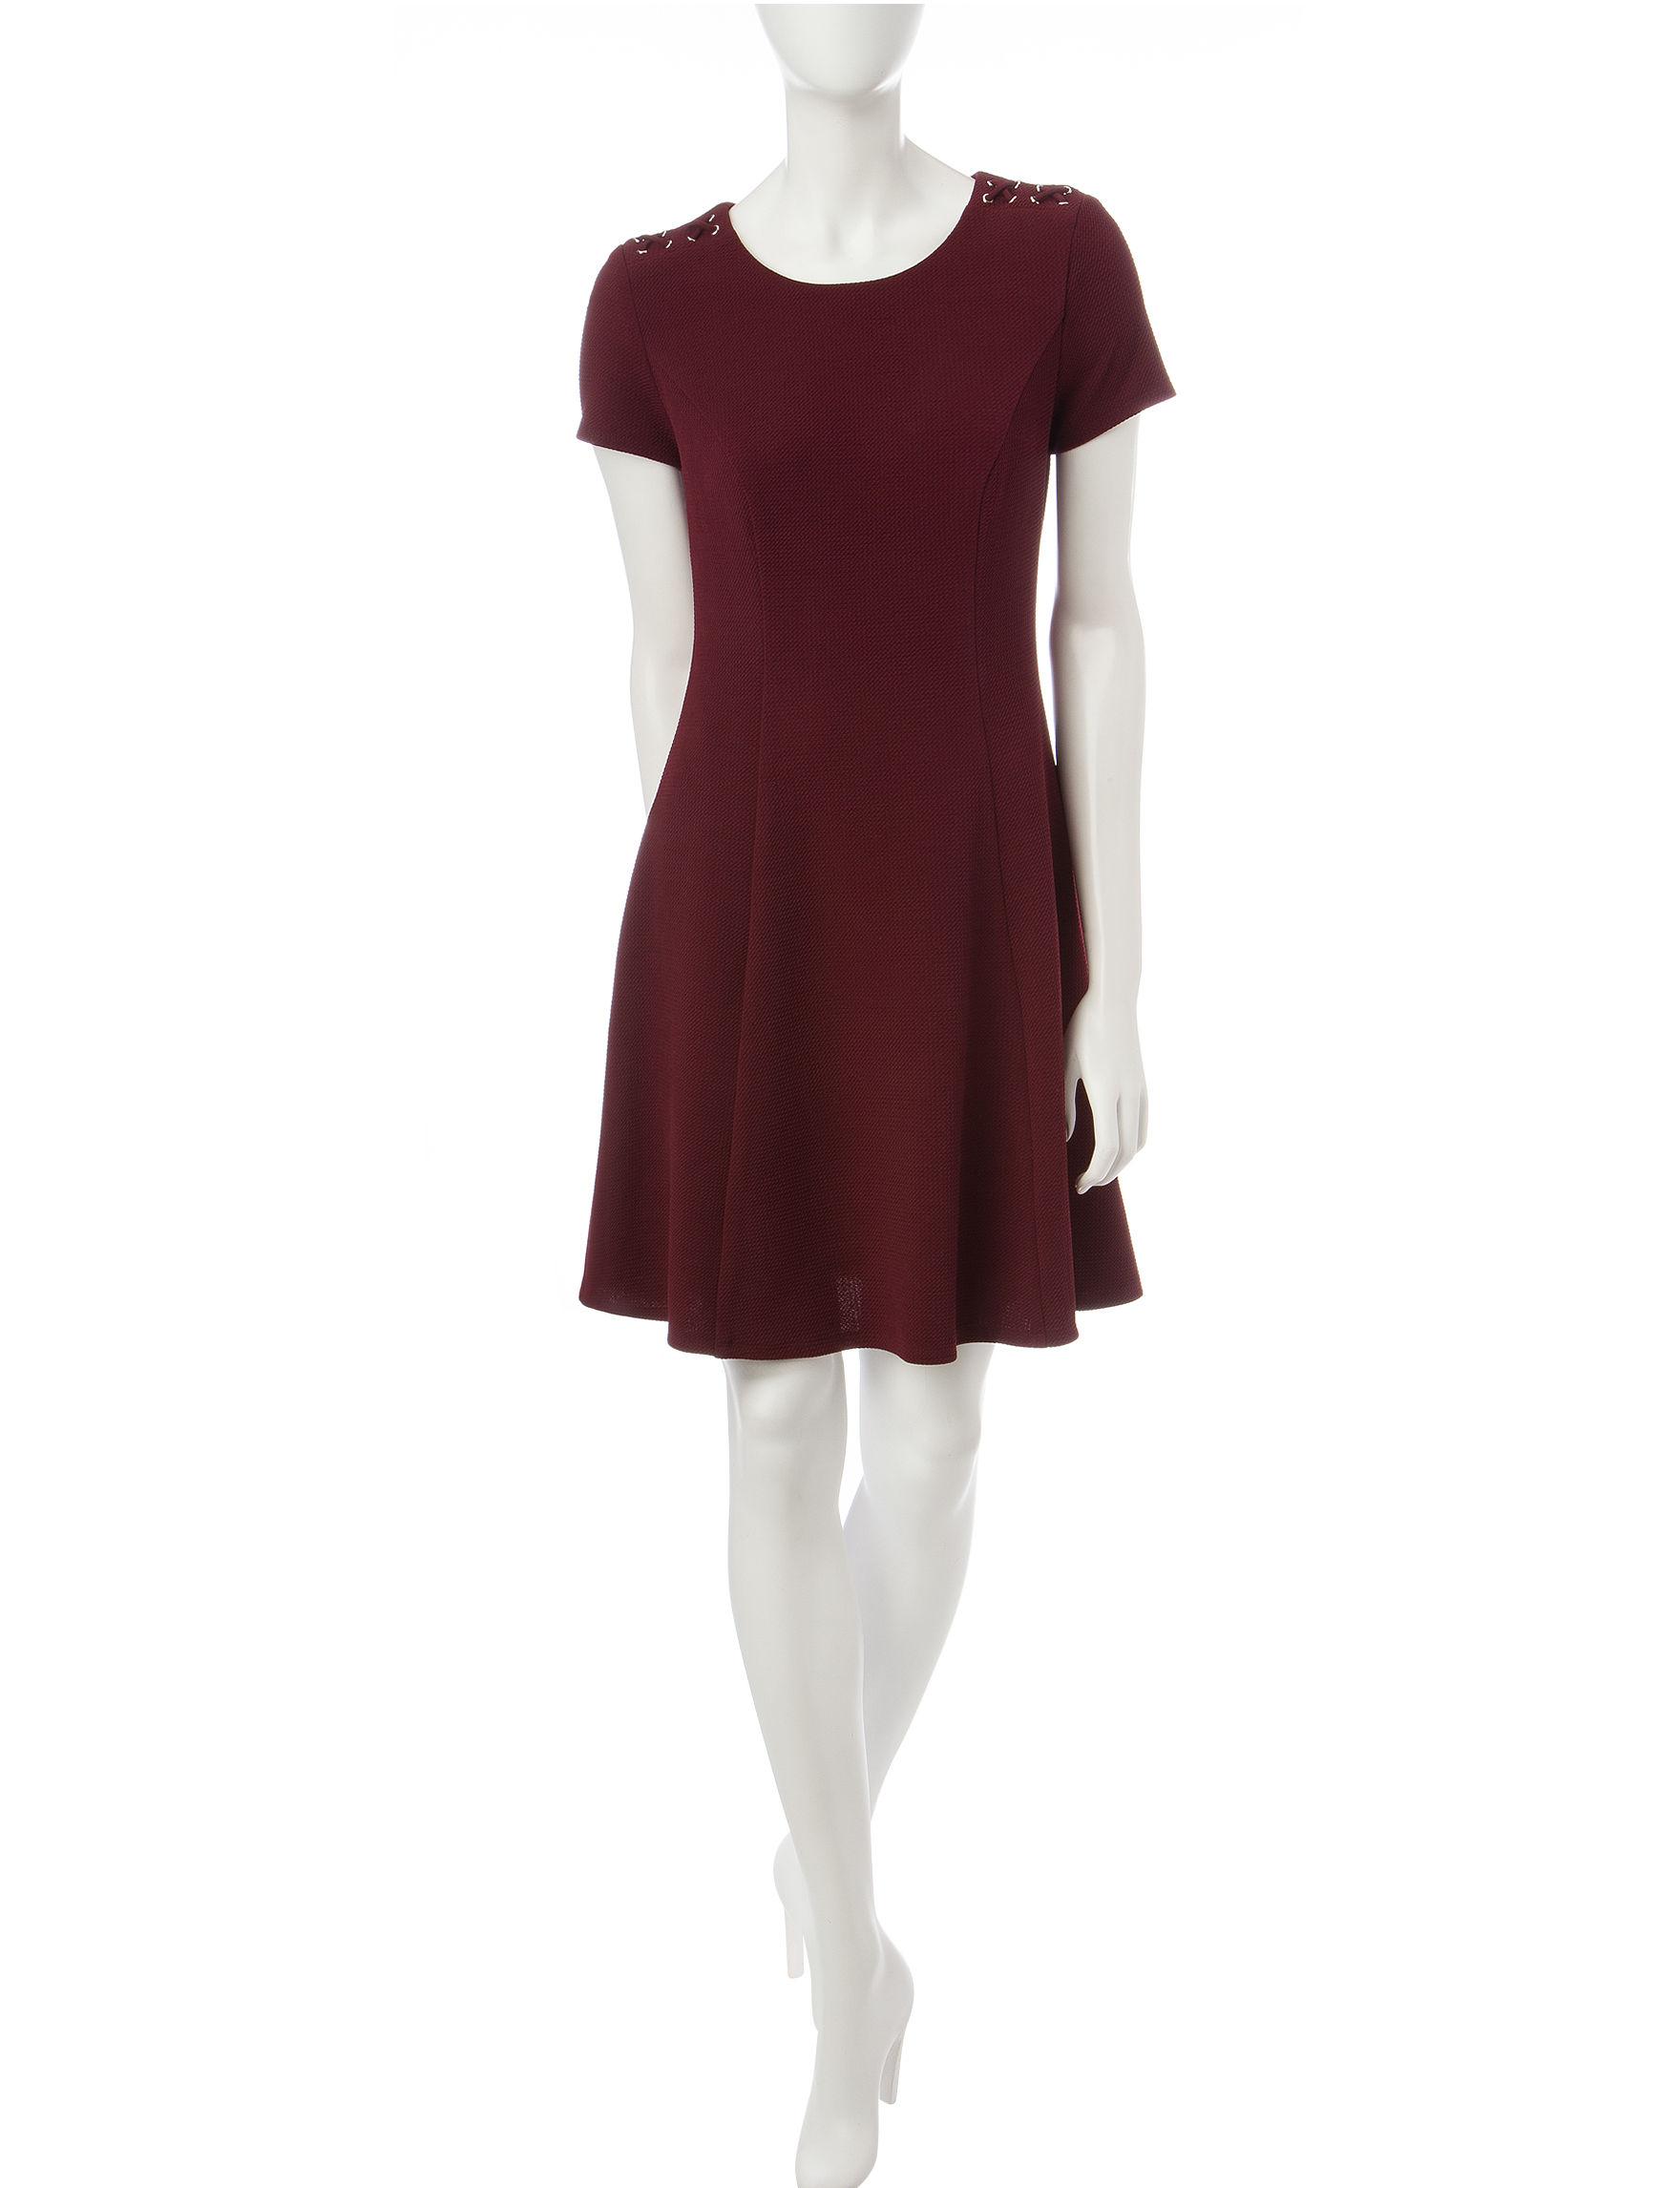 A. Byer Burgandy A-line Dresses